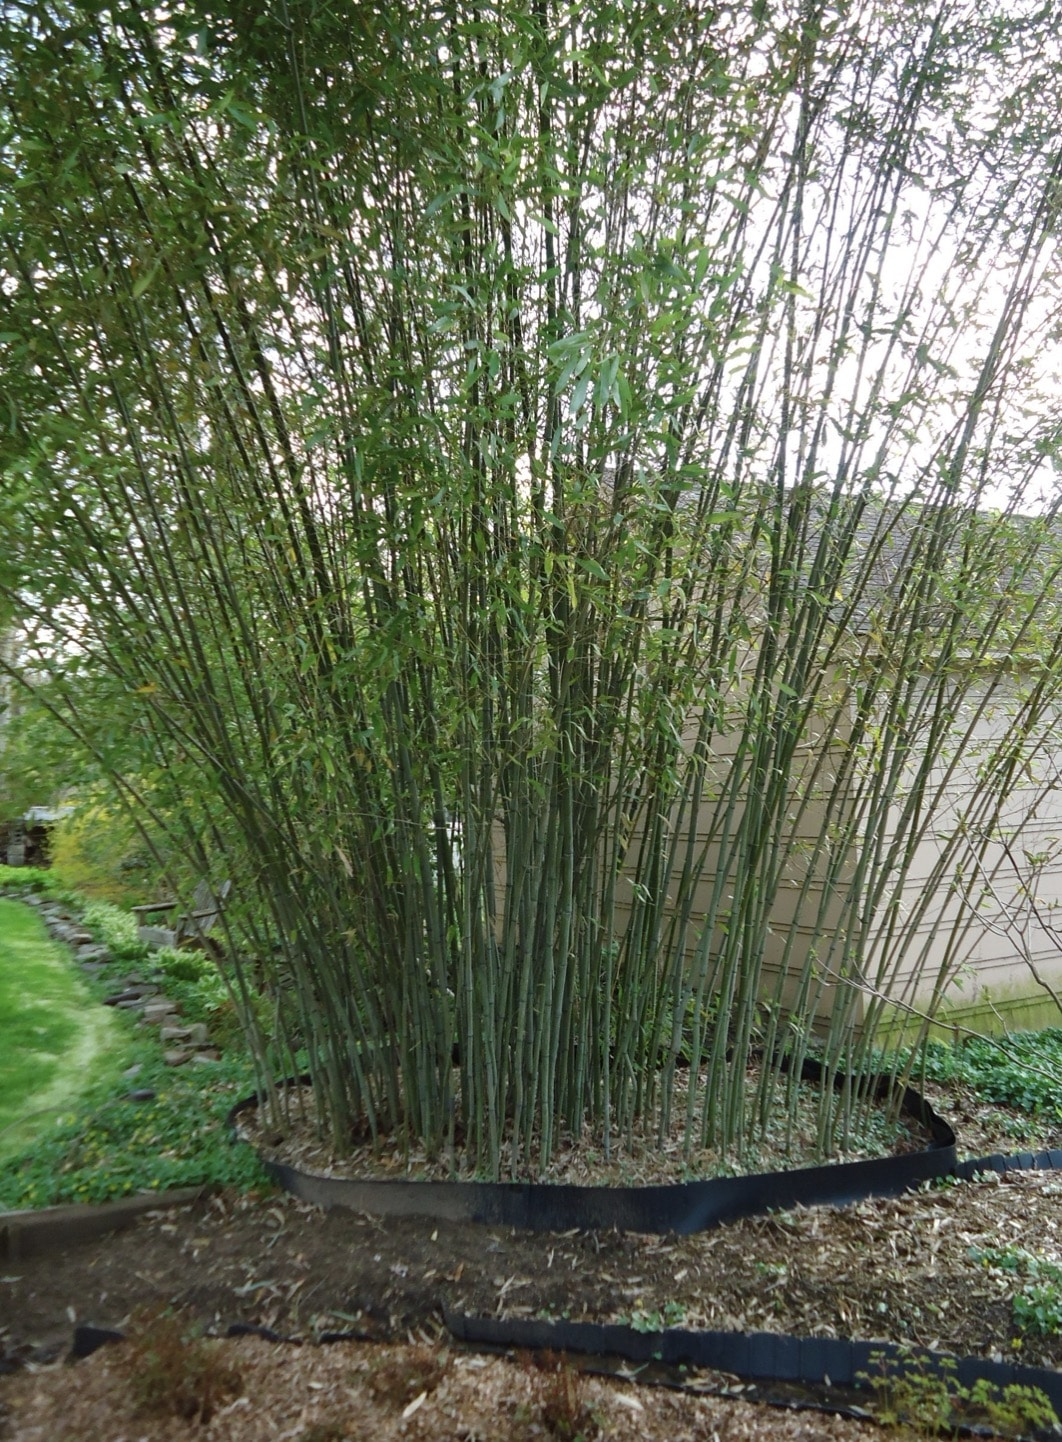 Growing bamboo in the backyard